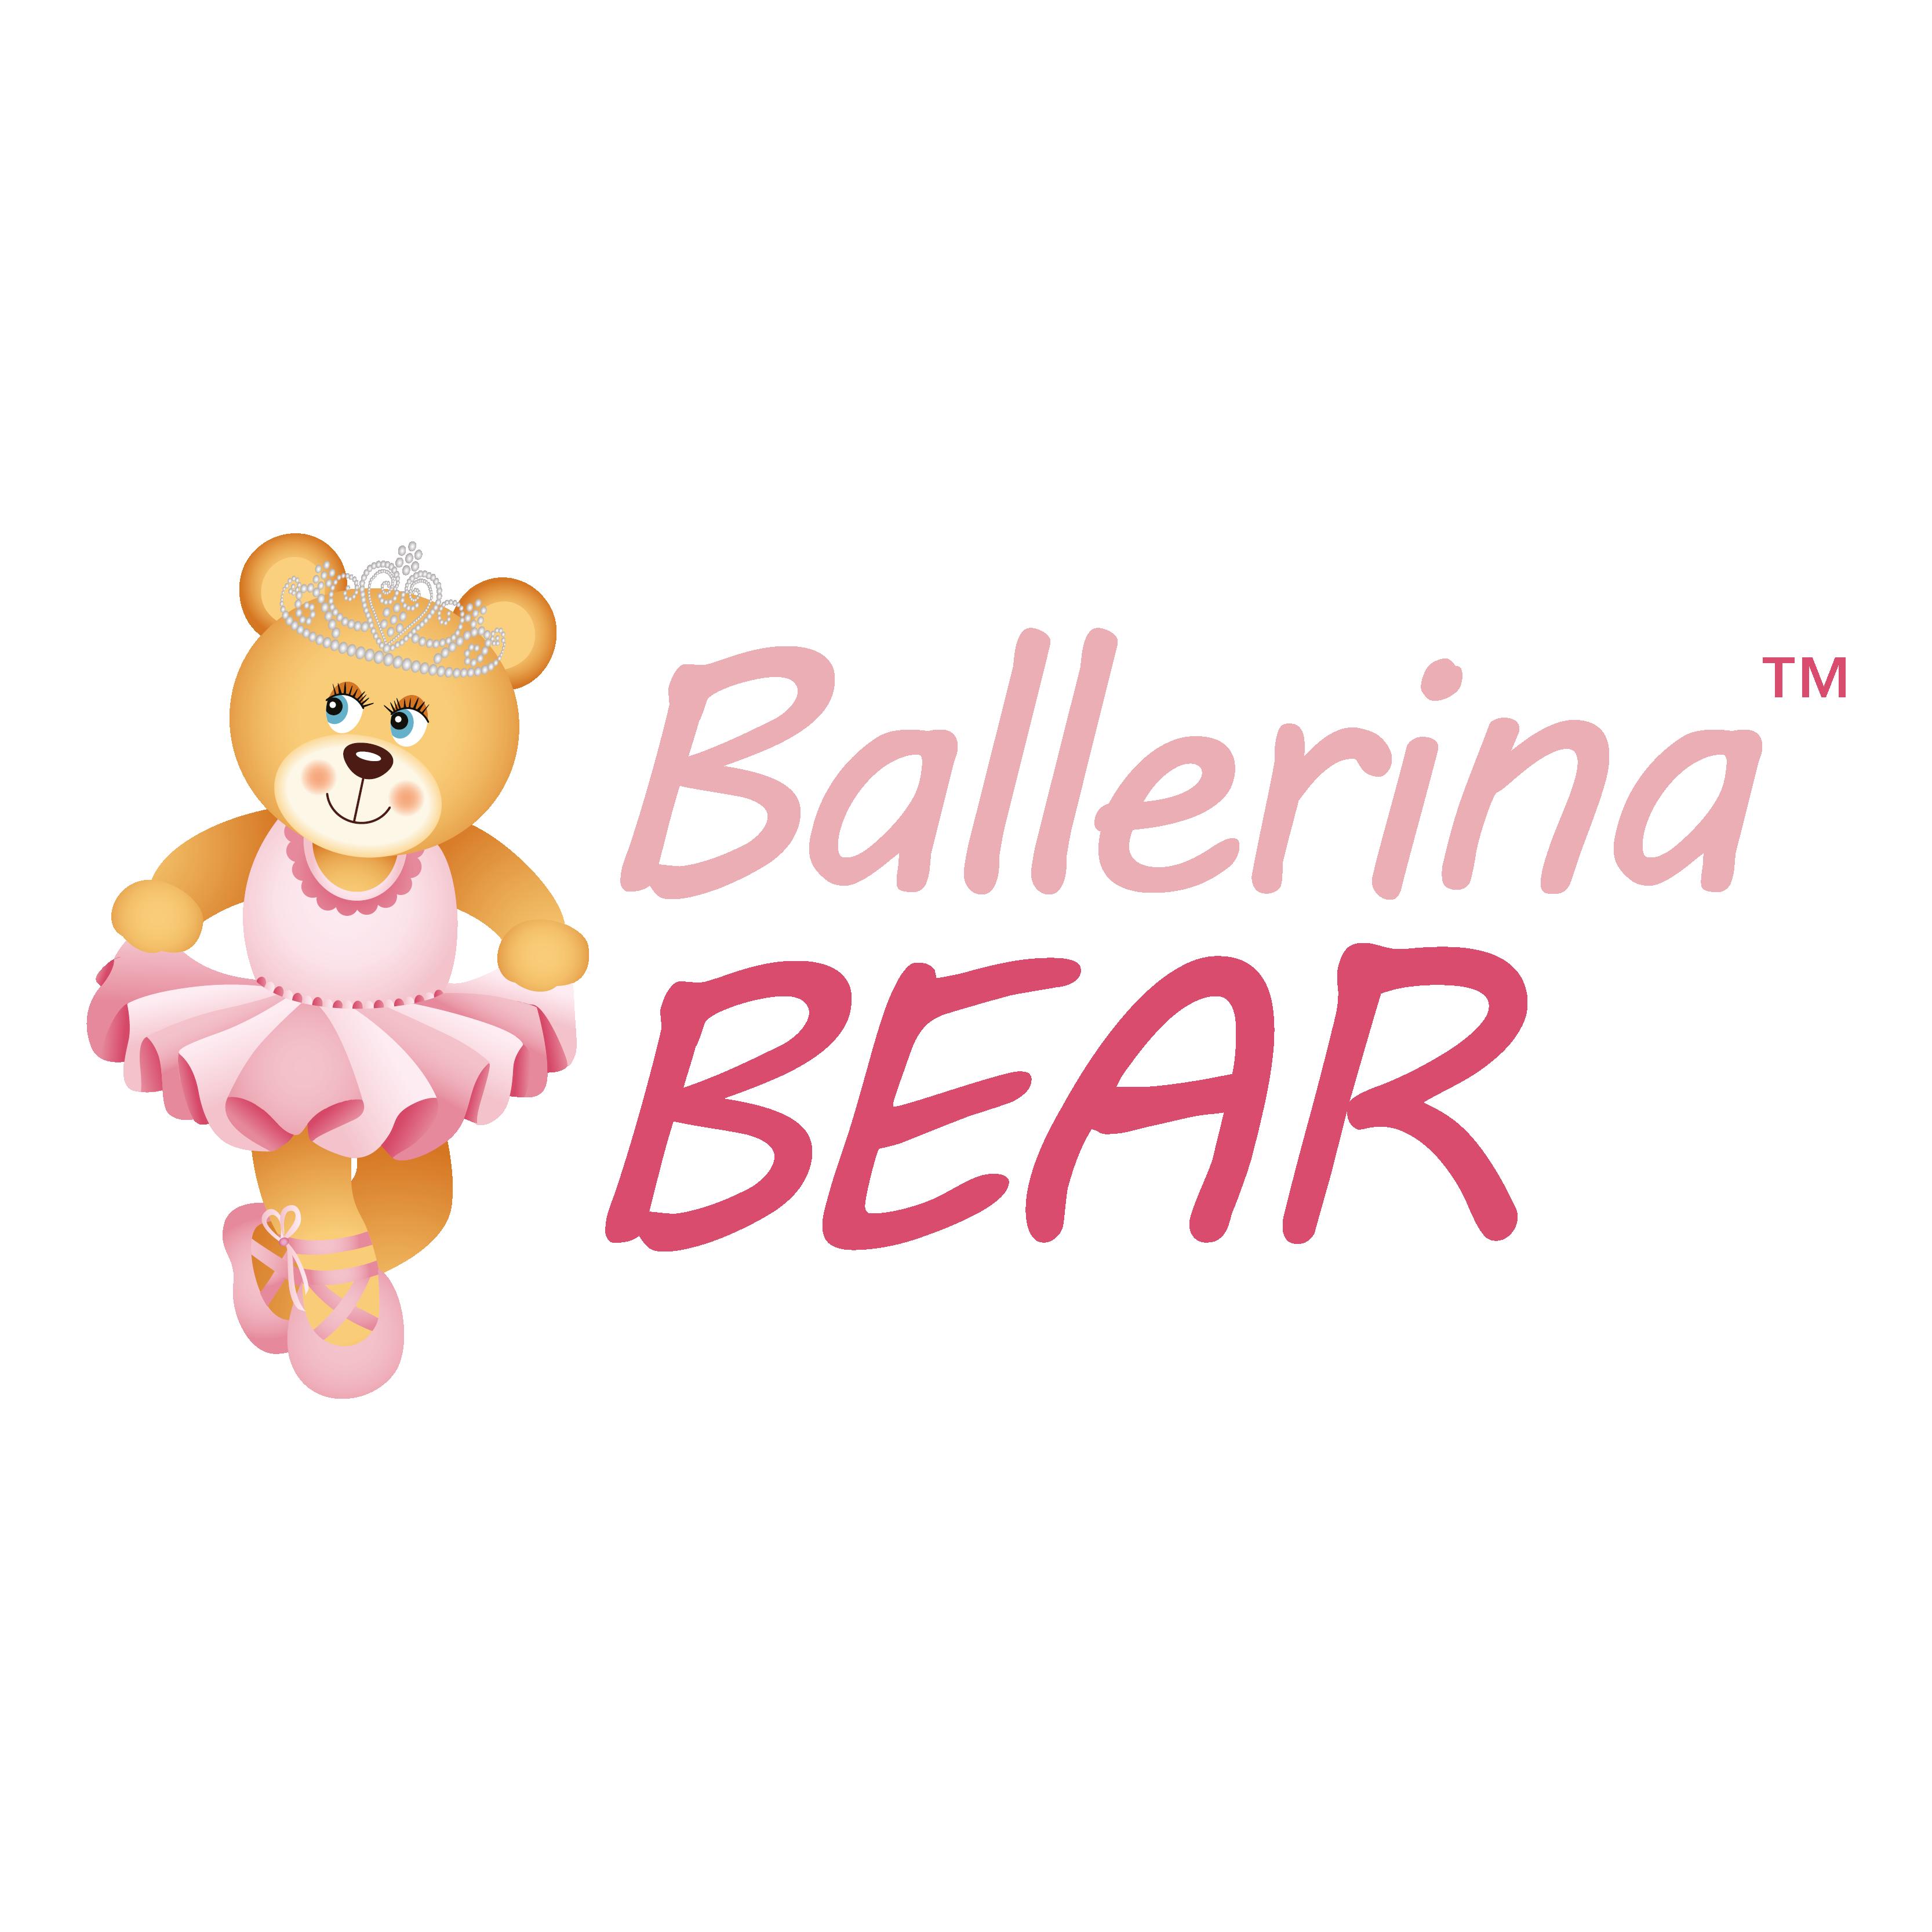 Ballerina Bear.